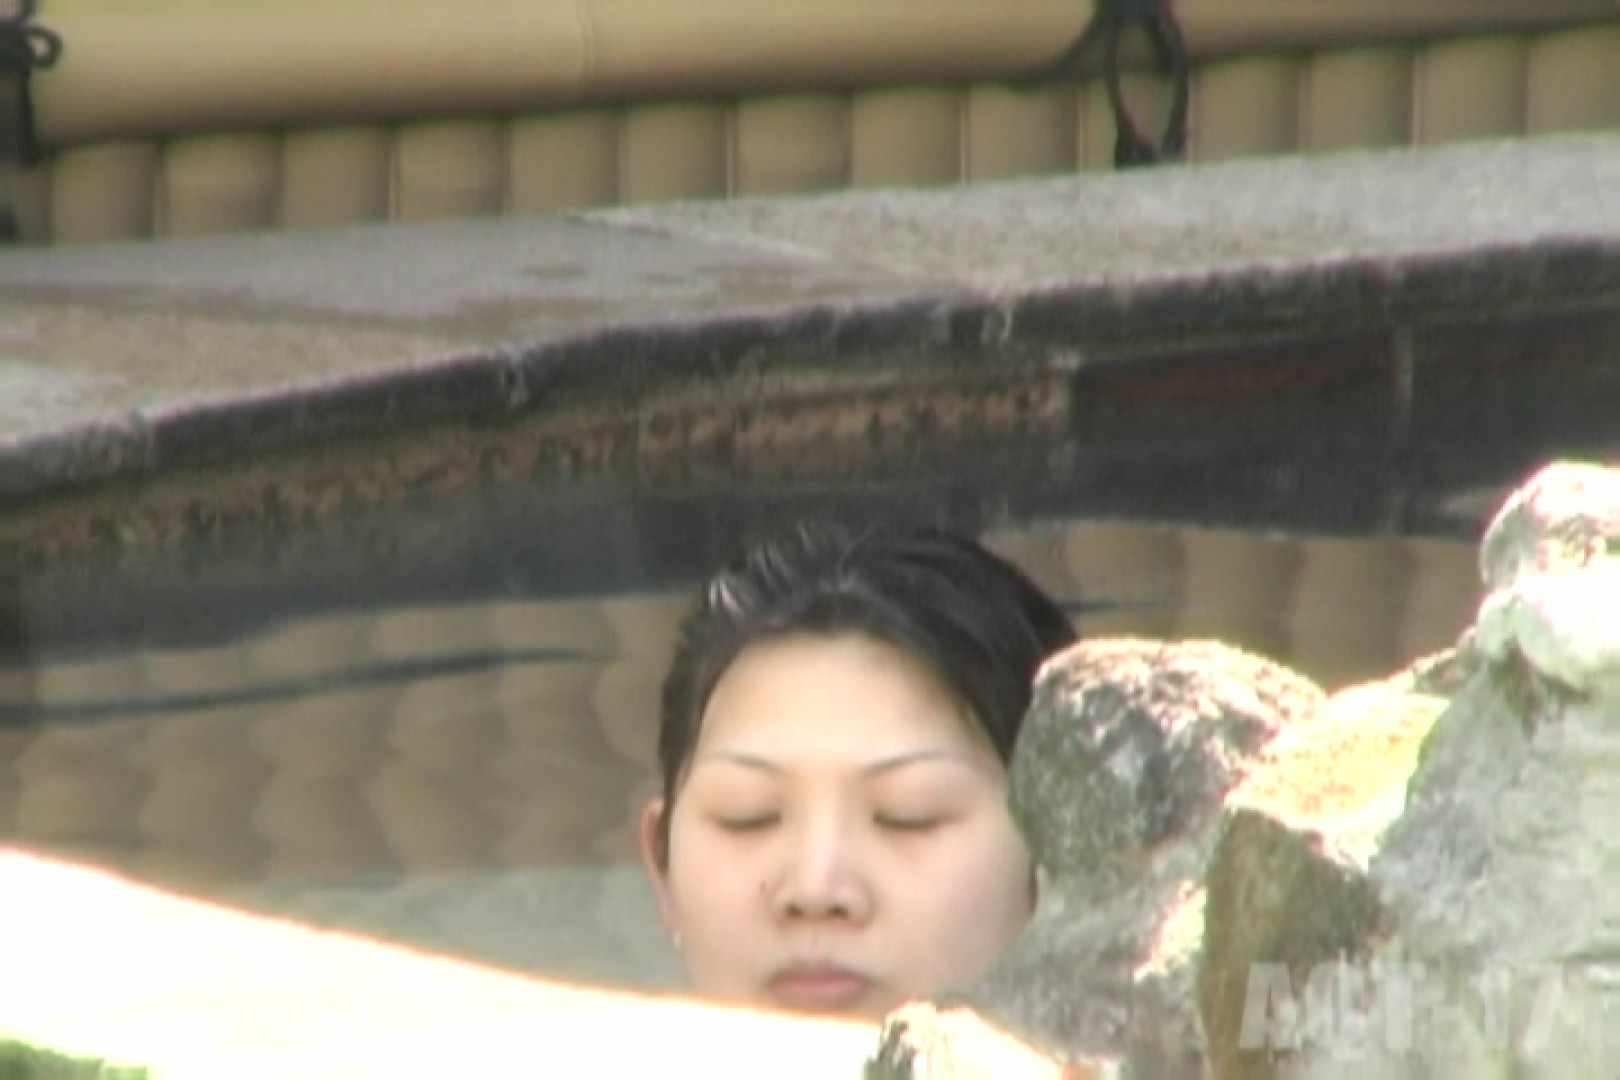 Aquaな露天風呂Vol.850 盗撮シリーズ | 露天風呂編  88PIX 33